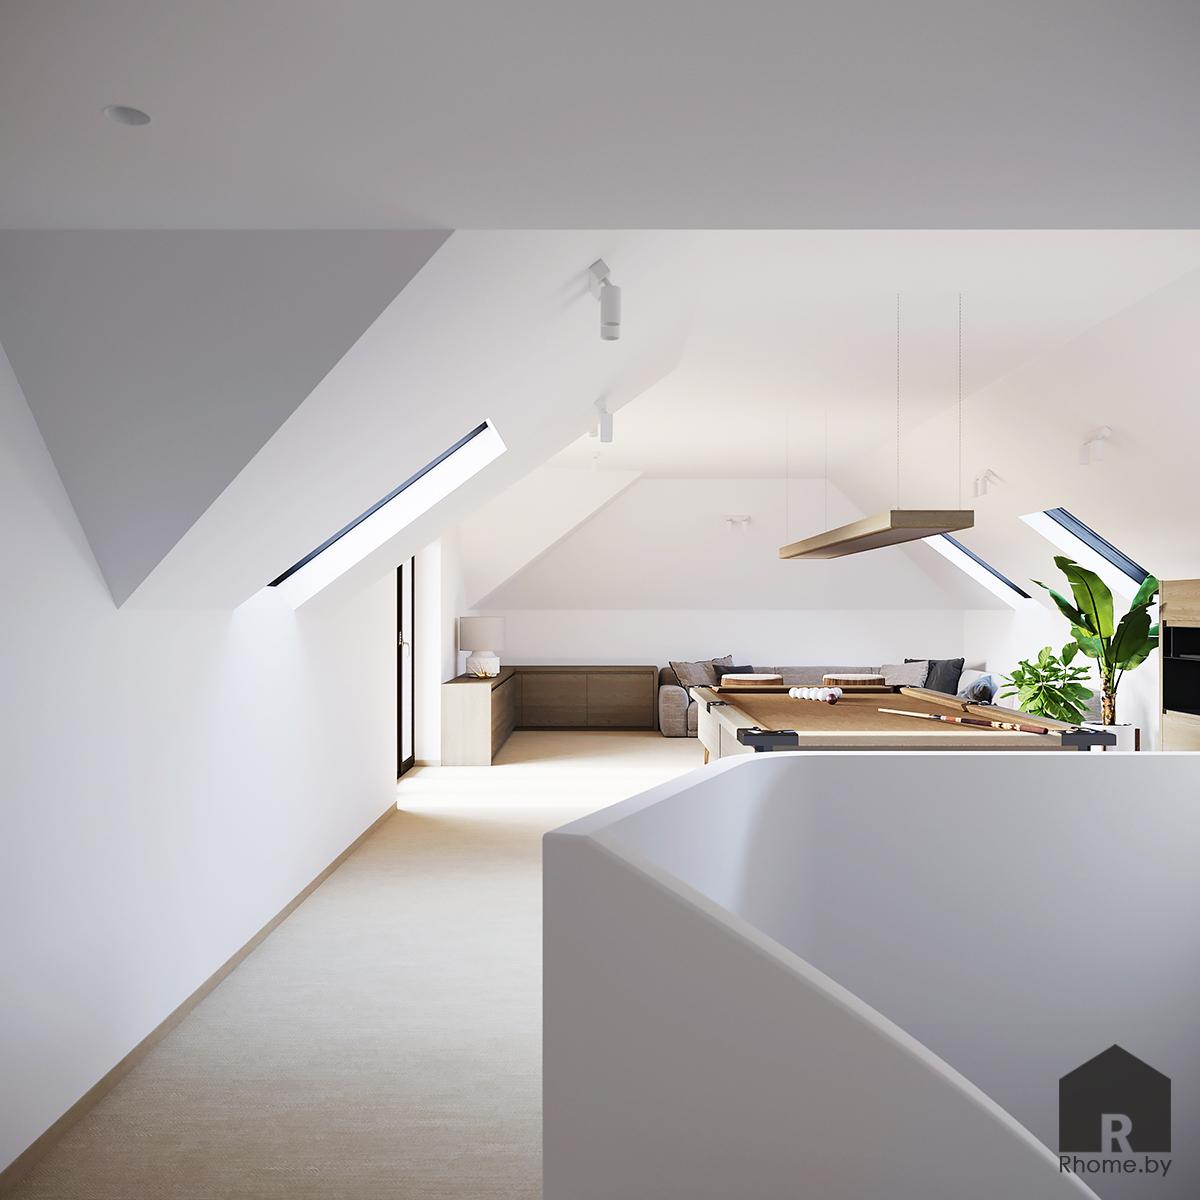 Дизайн комнаты отдыха | Дизайн студия – Rhome.by